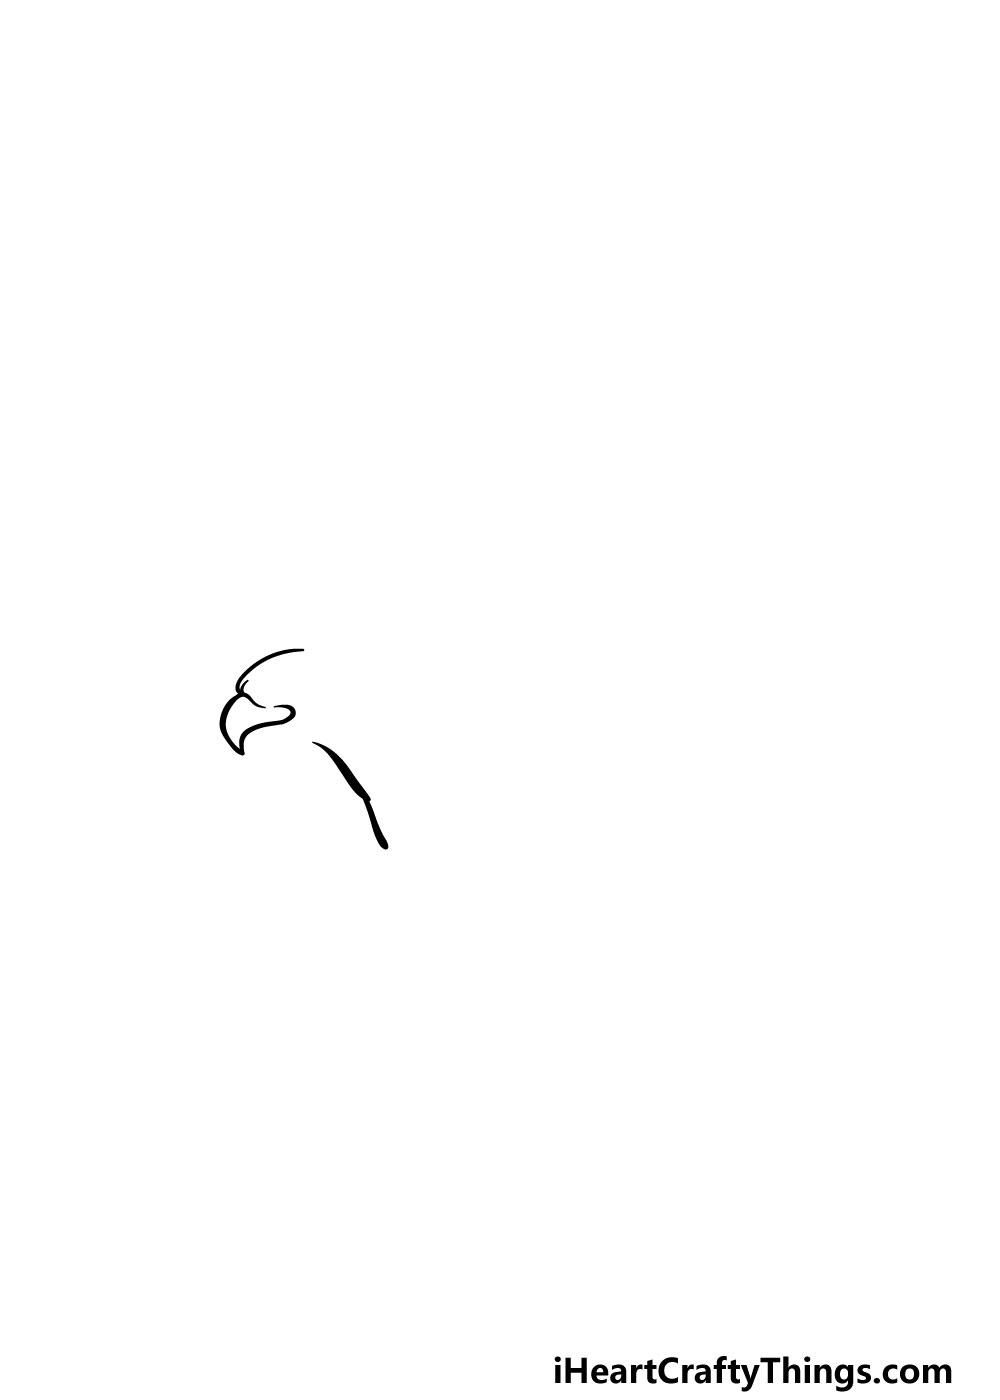 bald eagle drawing step 1